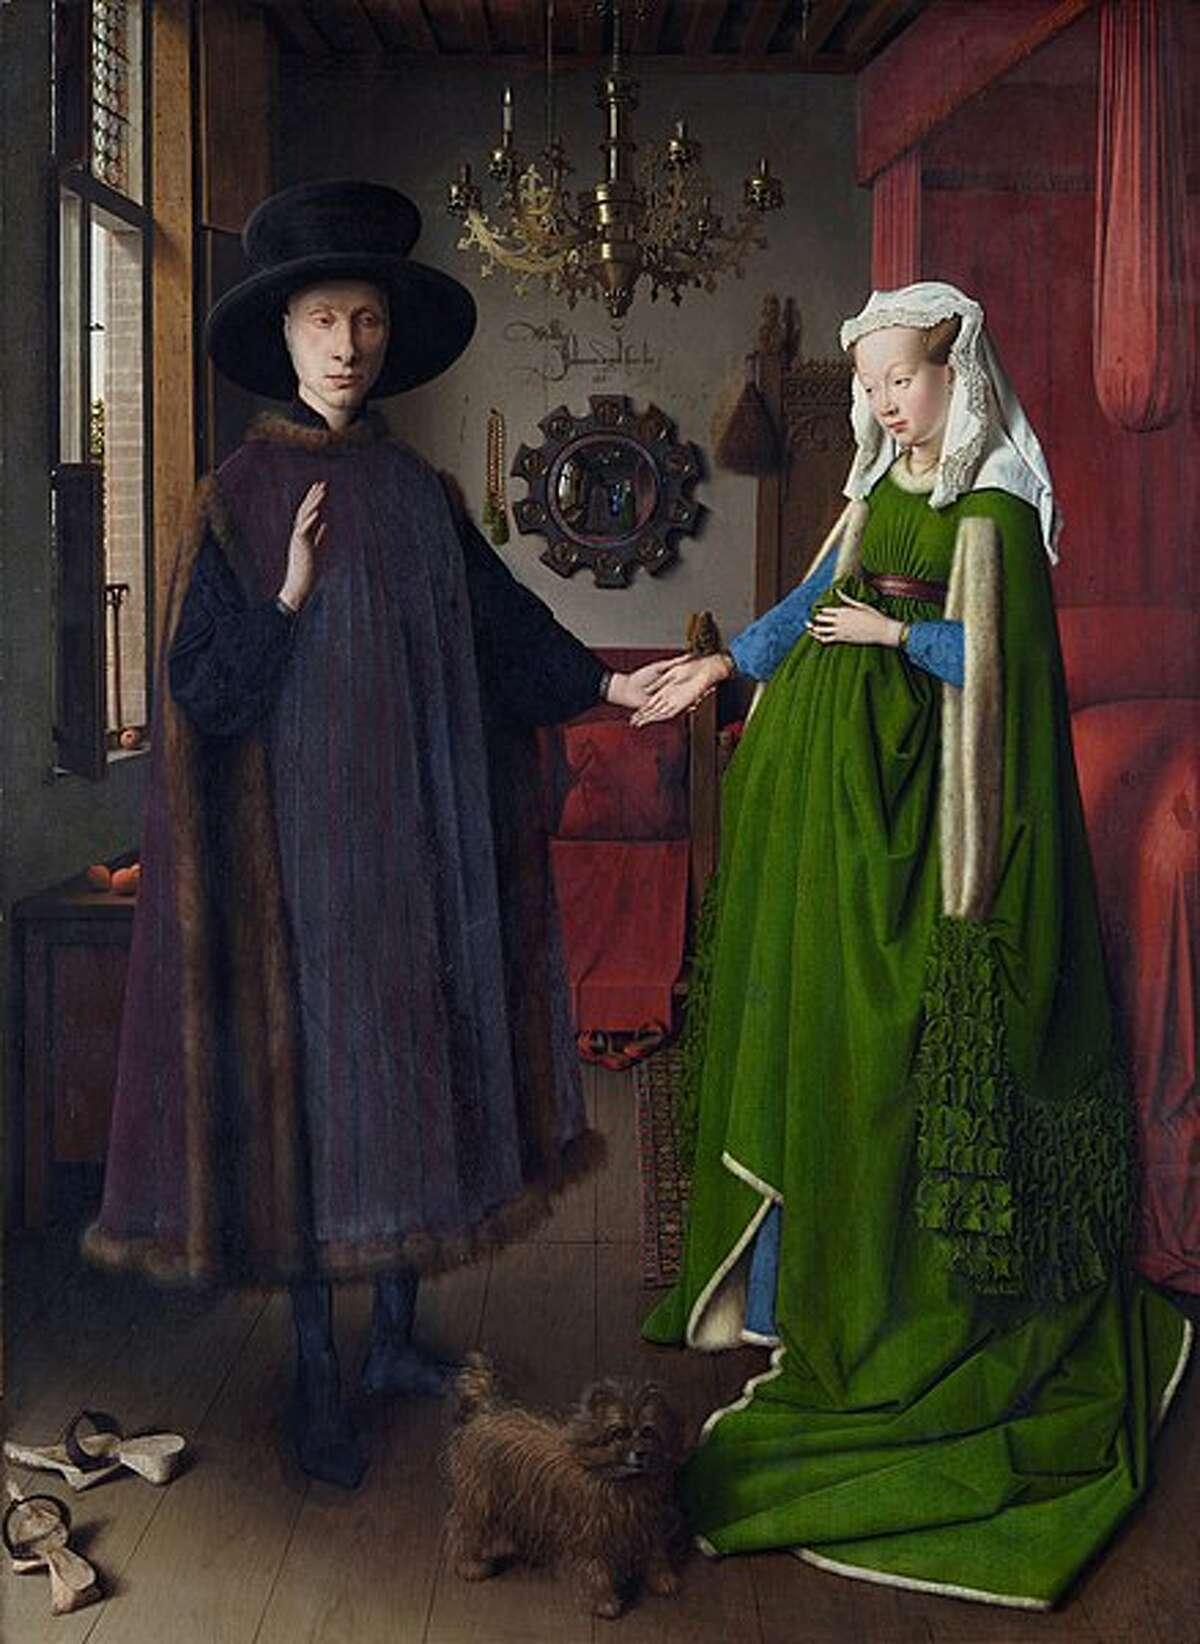 """The Arnolfini Marriage"" by Jan van Eyck dates to 1434."